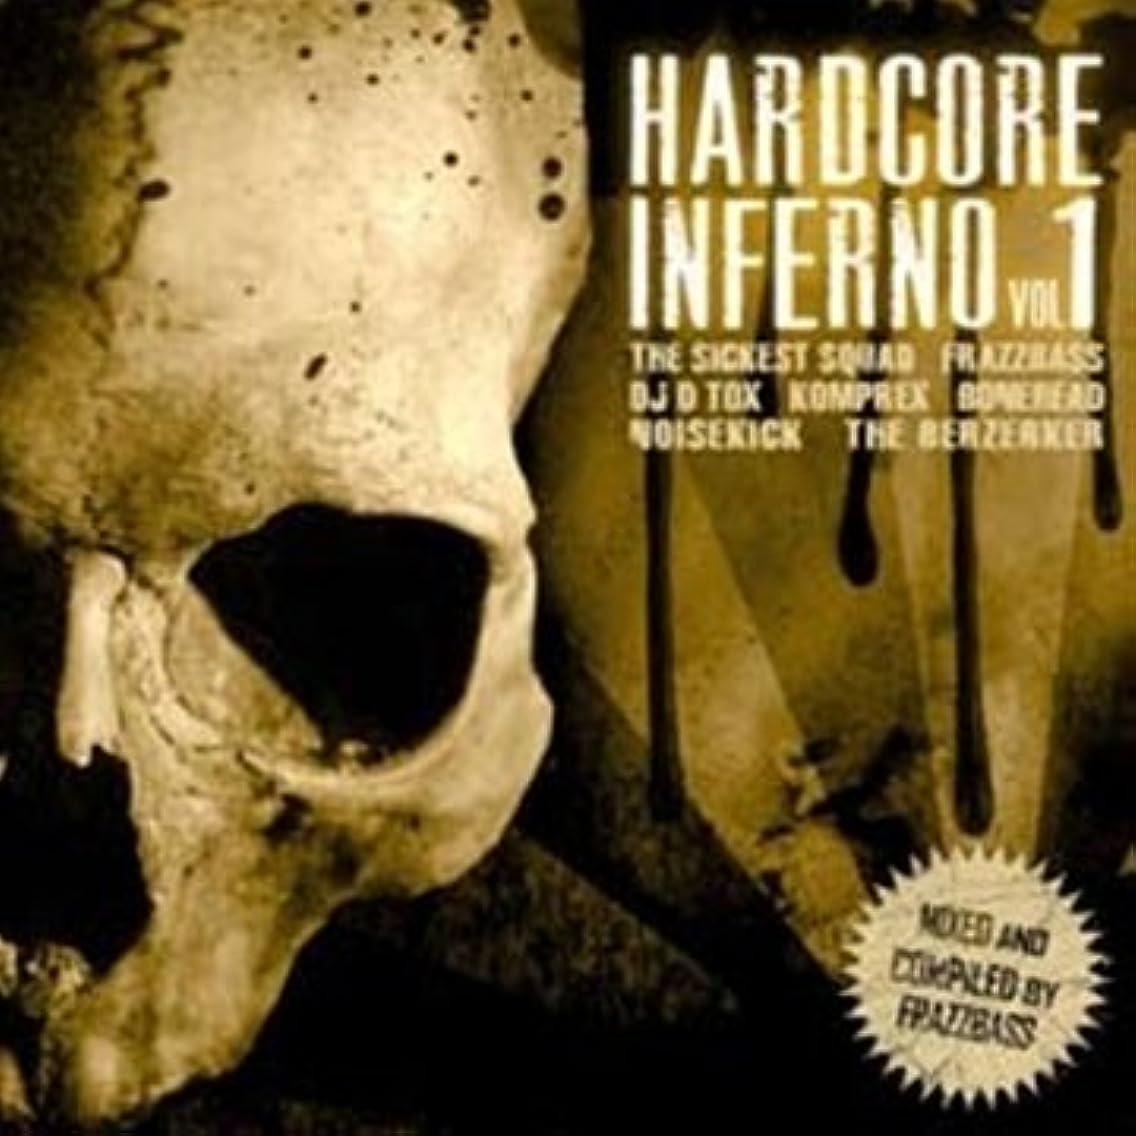 Hardcore Inferno Vol. 1